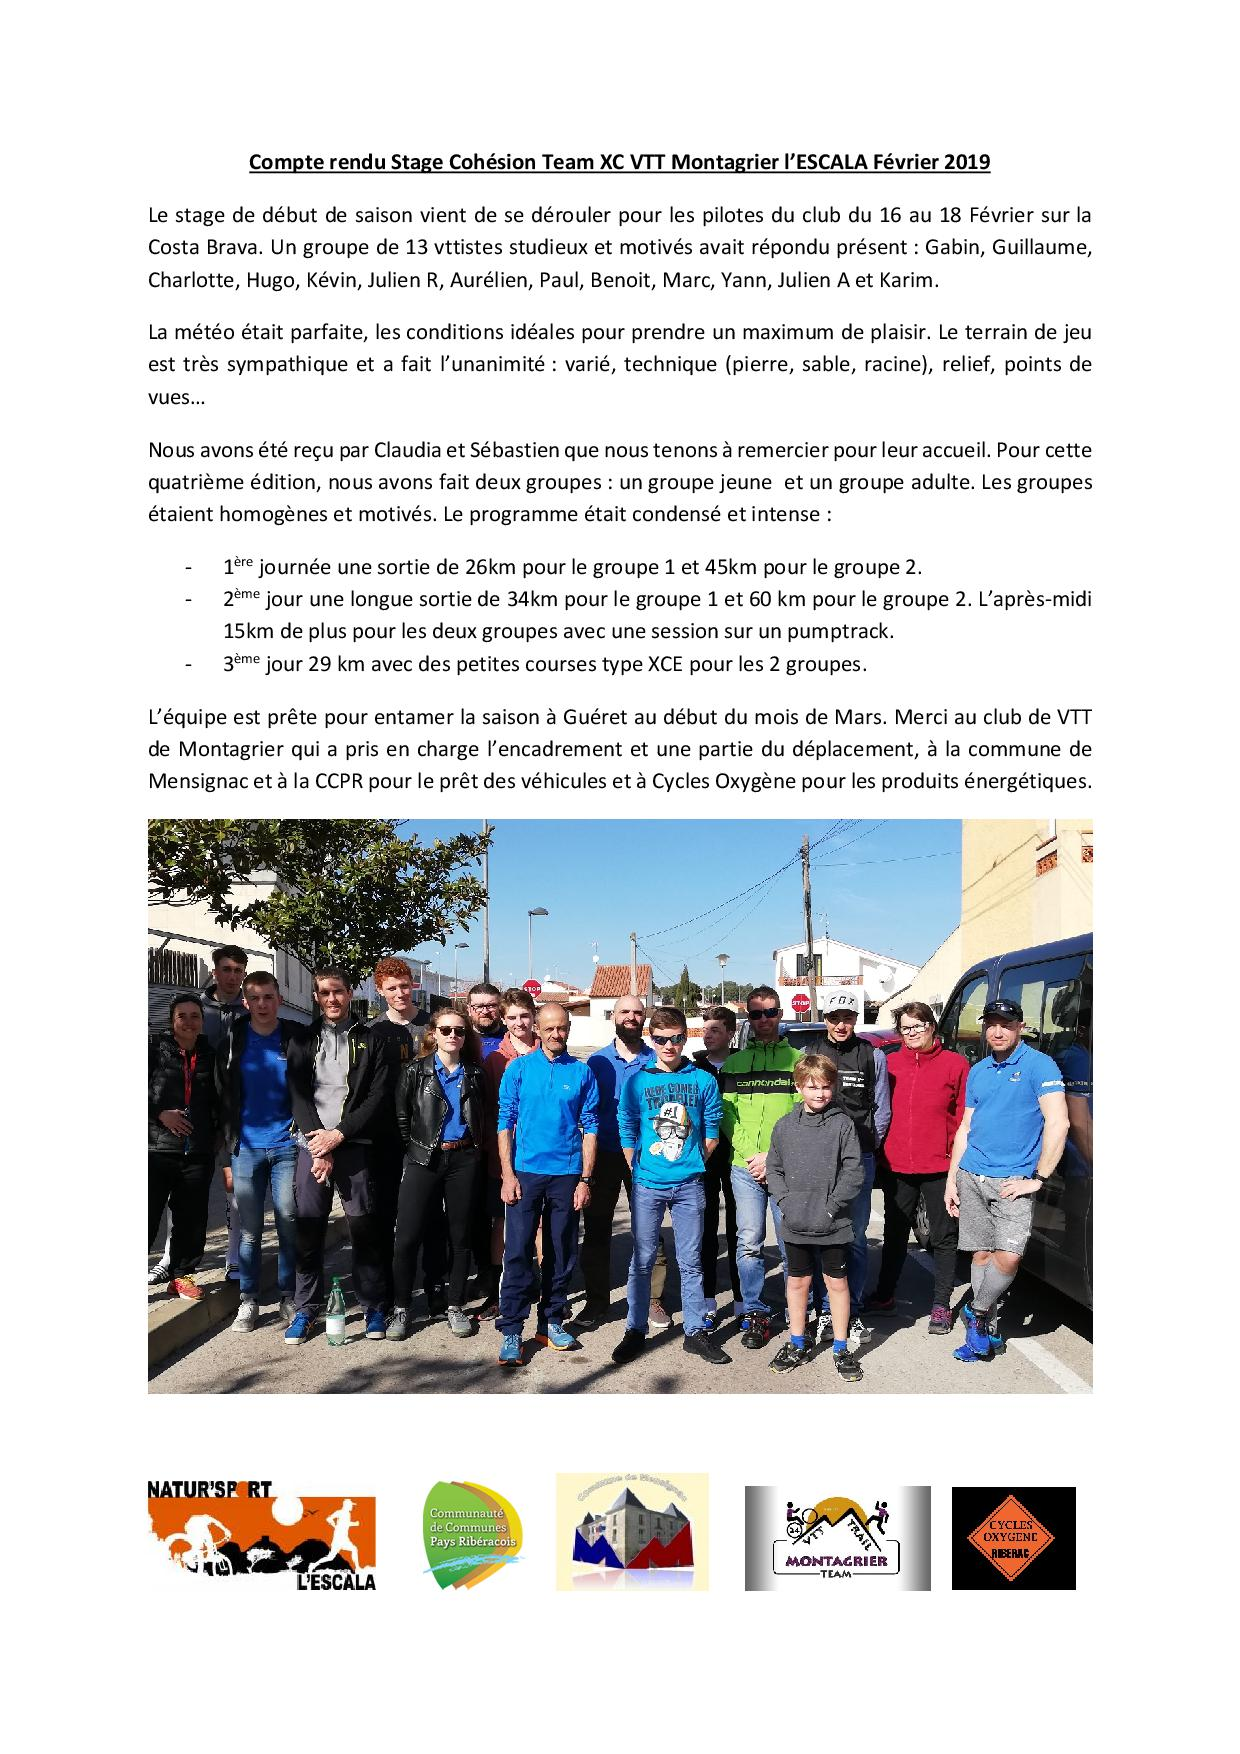 Compte rendu stage cohesion team xc mvtt 2019